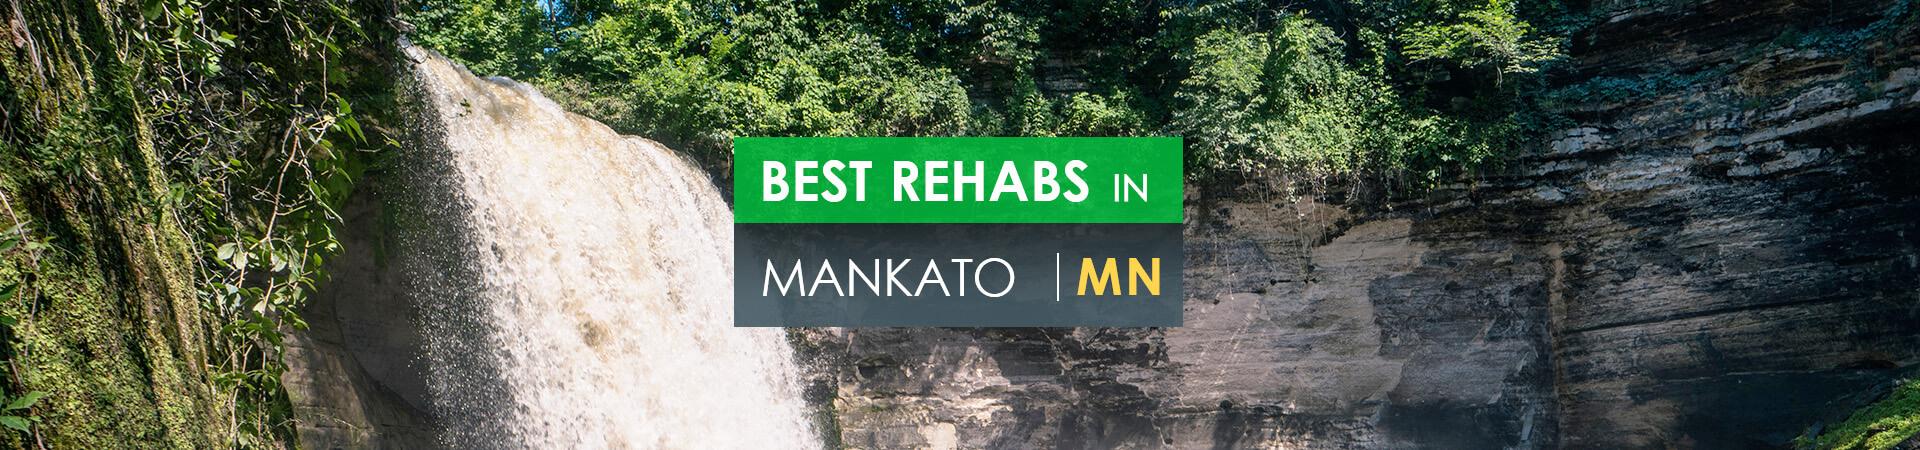 Best rehabs in Mankato, MN